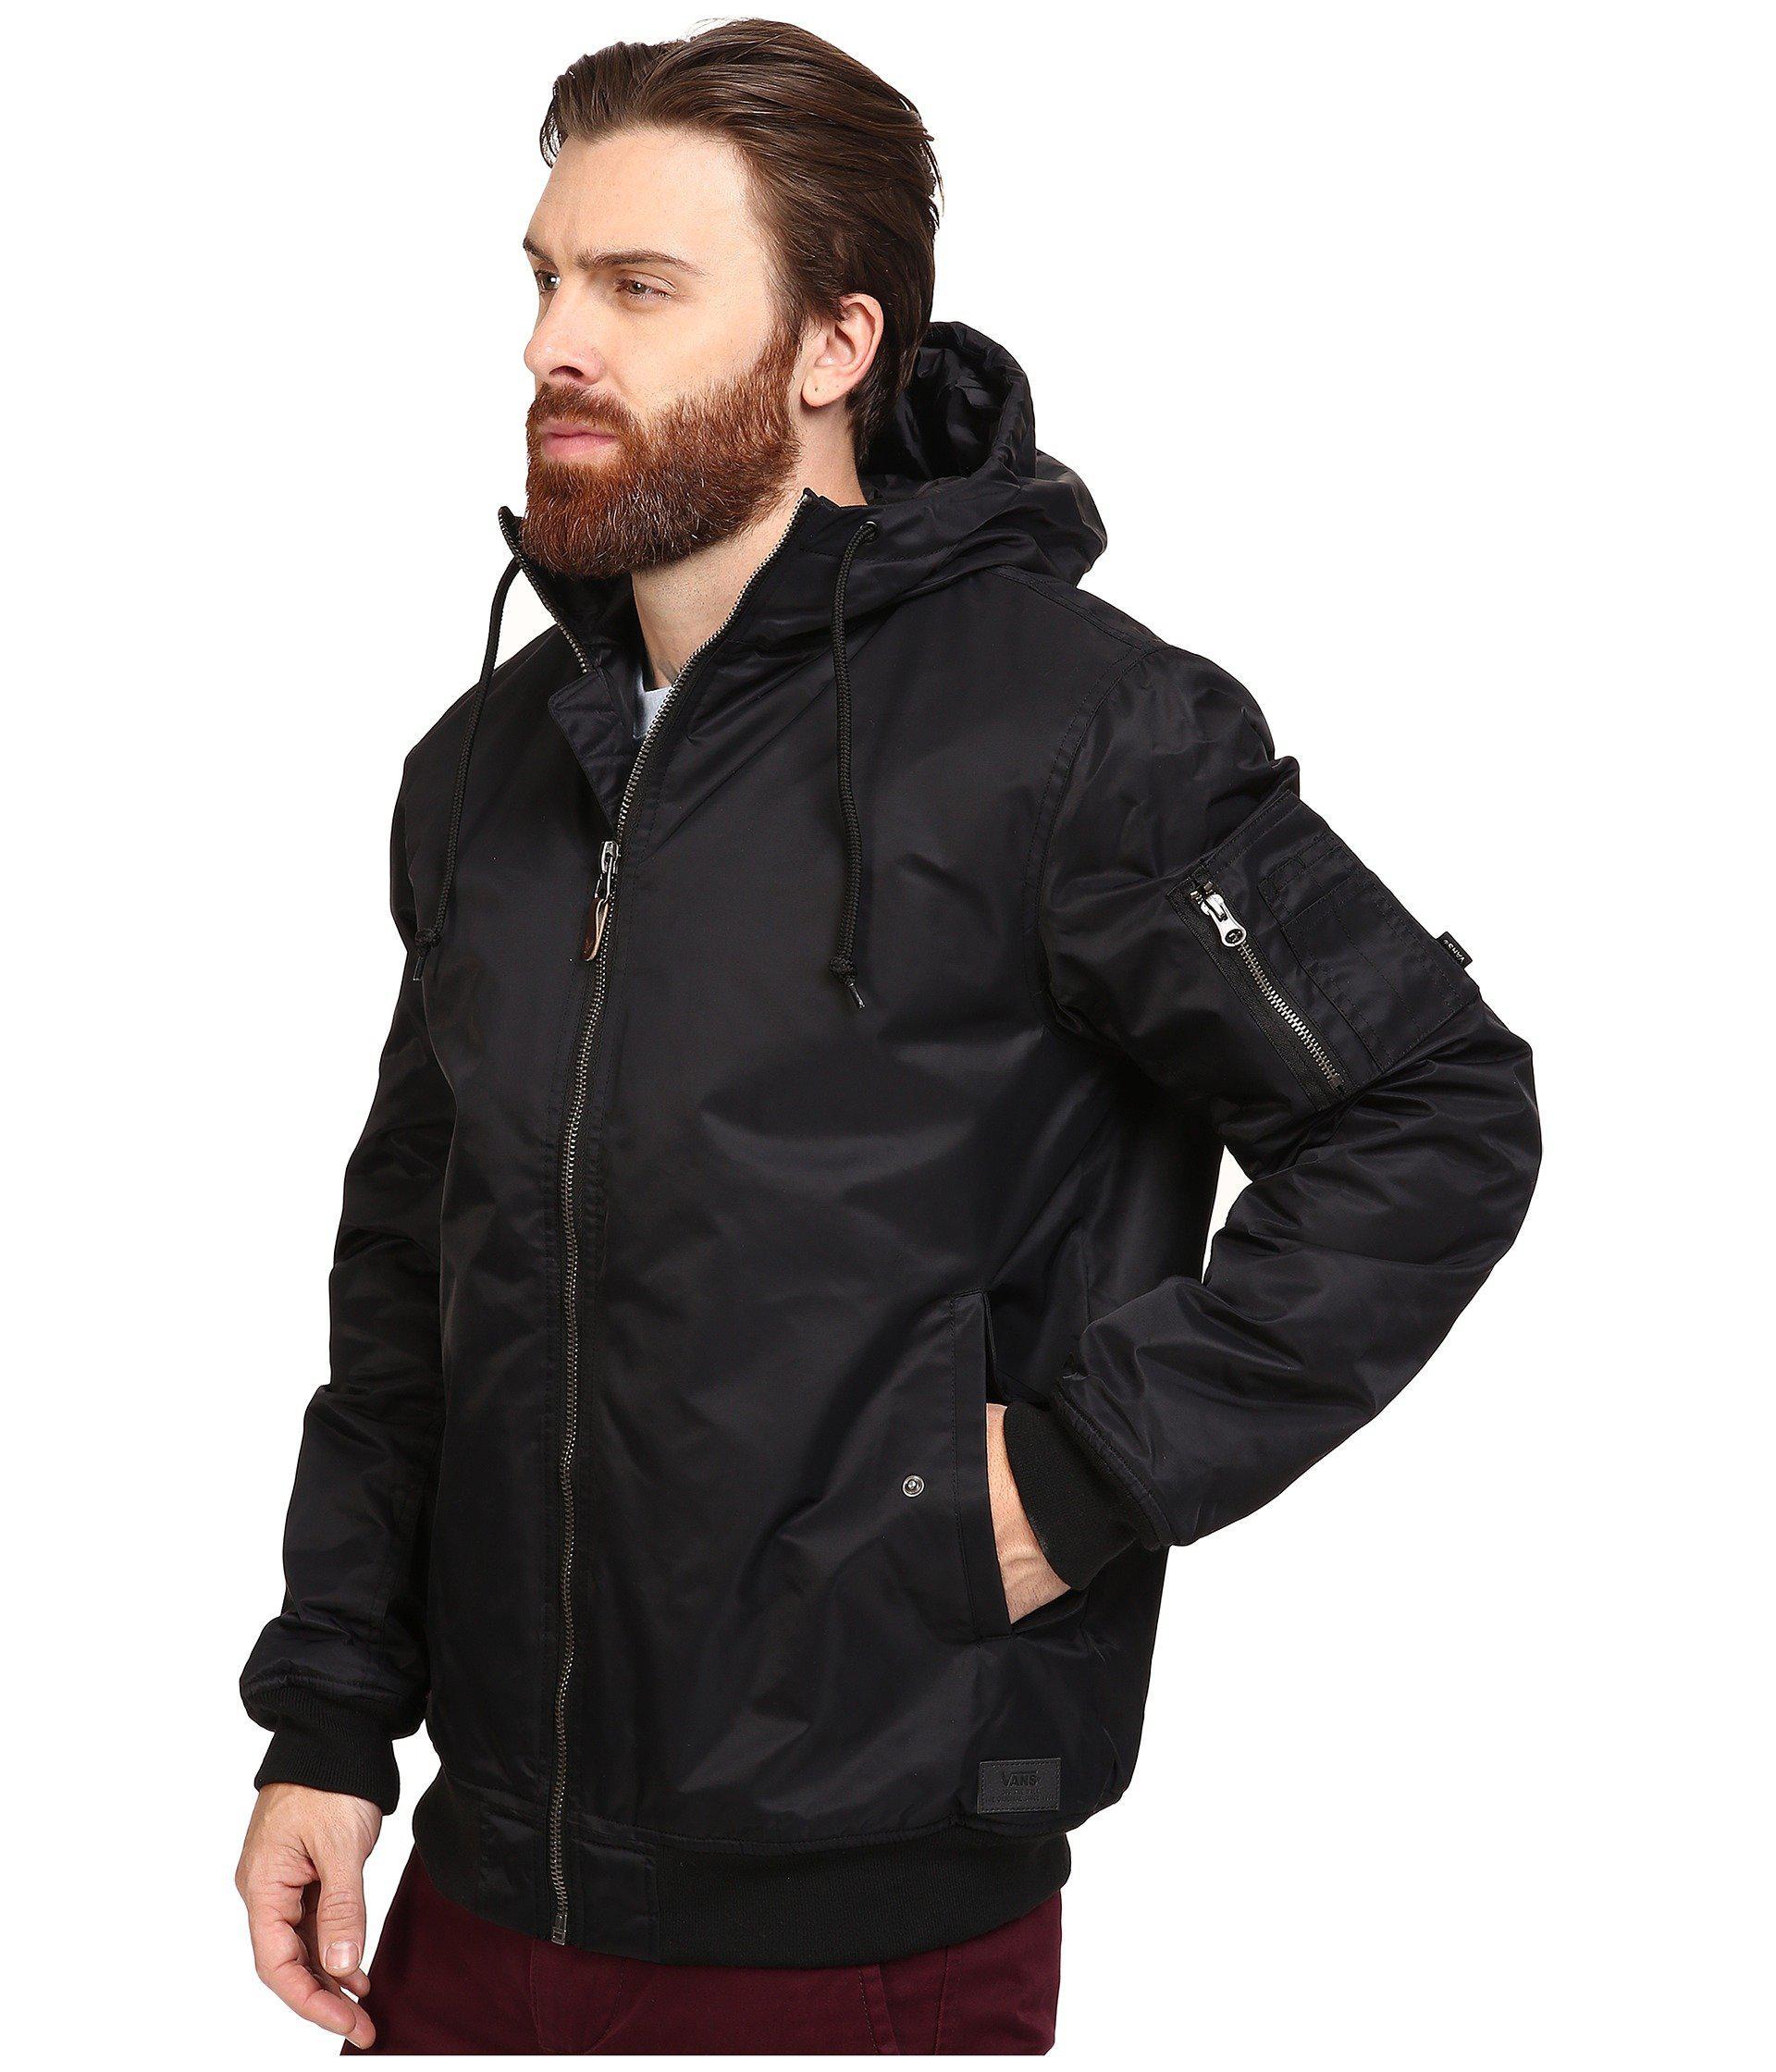 a685186e7ba Lyst - Vans Kilroy Mountain Edition Jacket in Black for Men